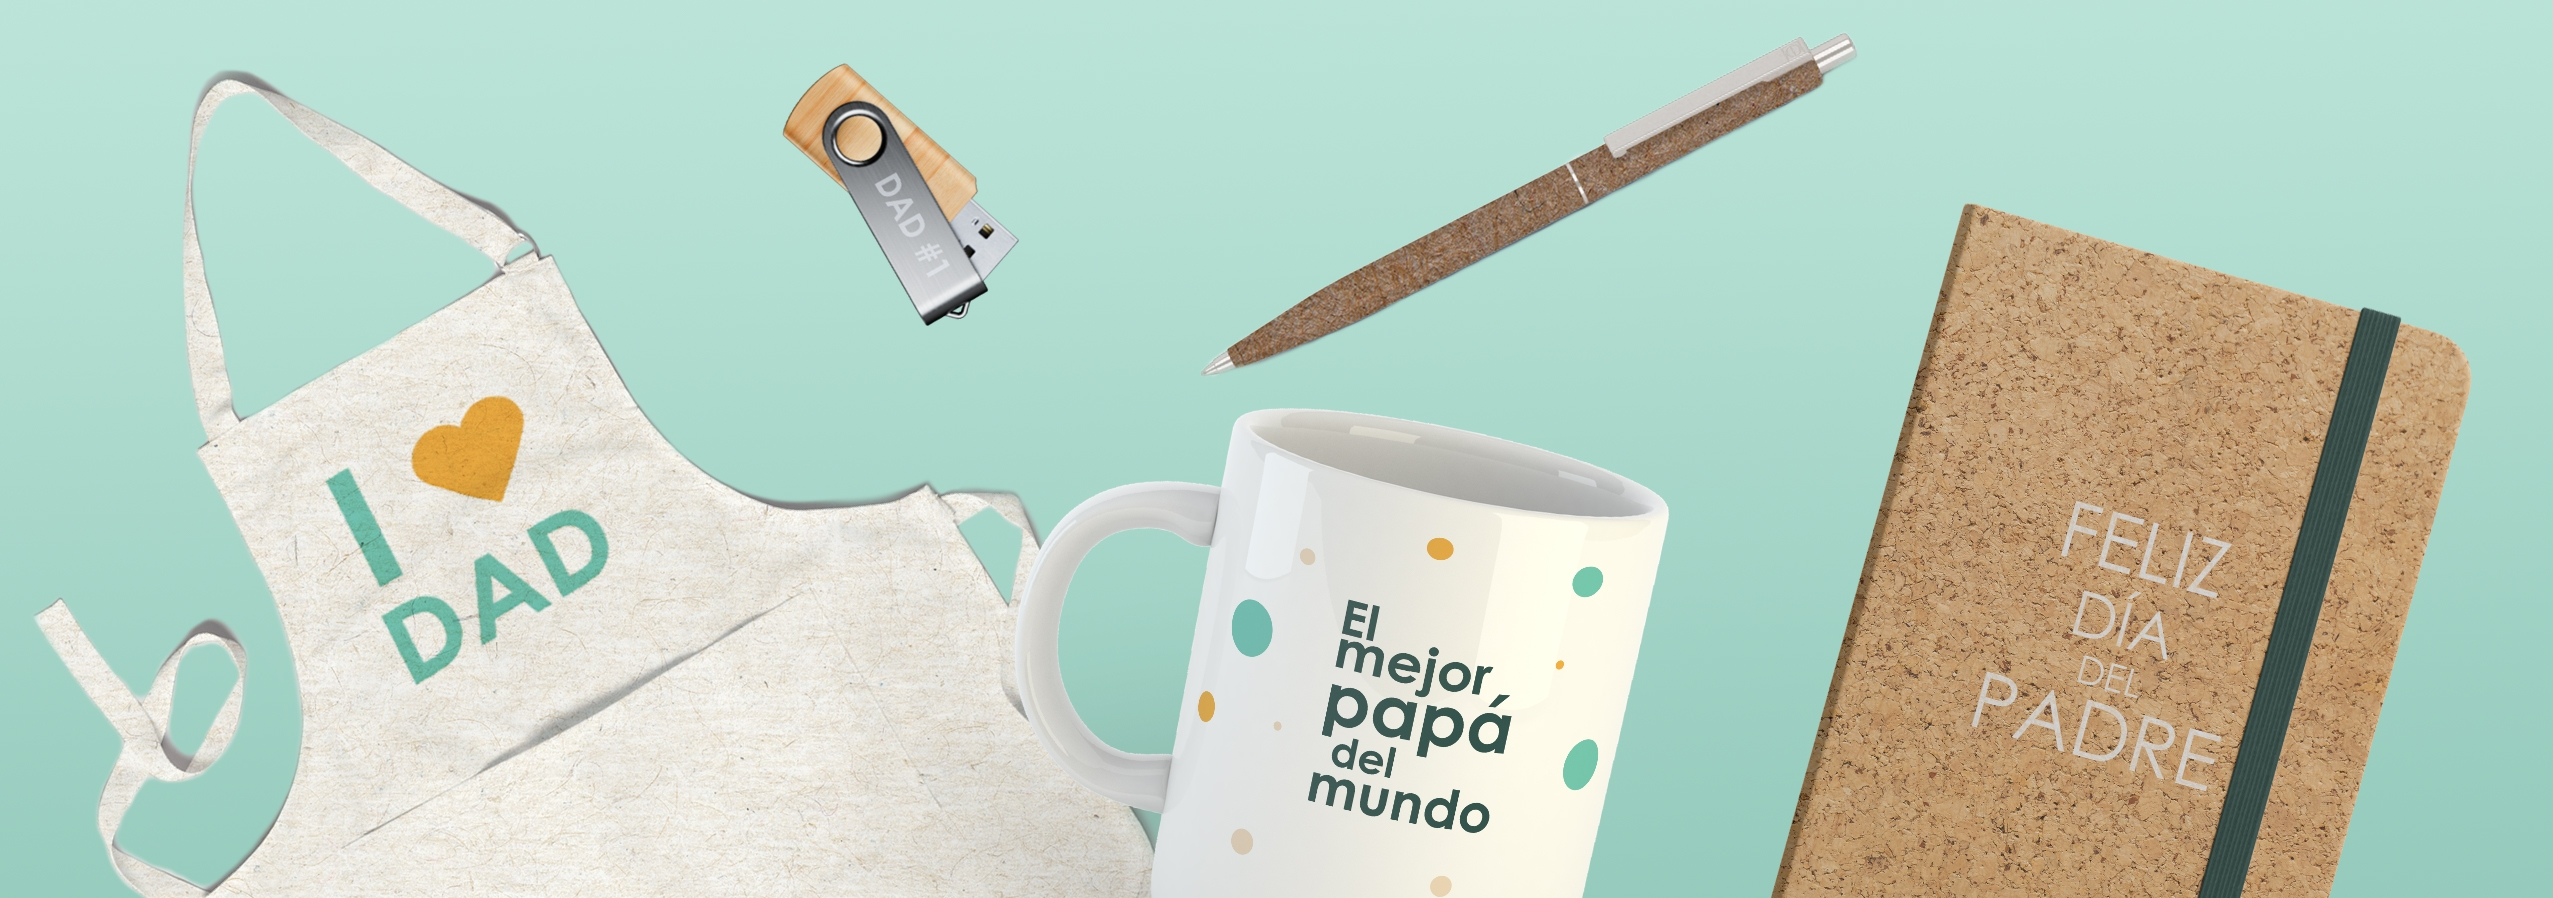 mejores_regalos_personalizados_dia_padre_slider_post_blog